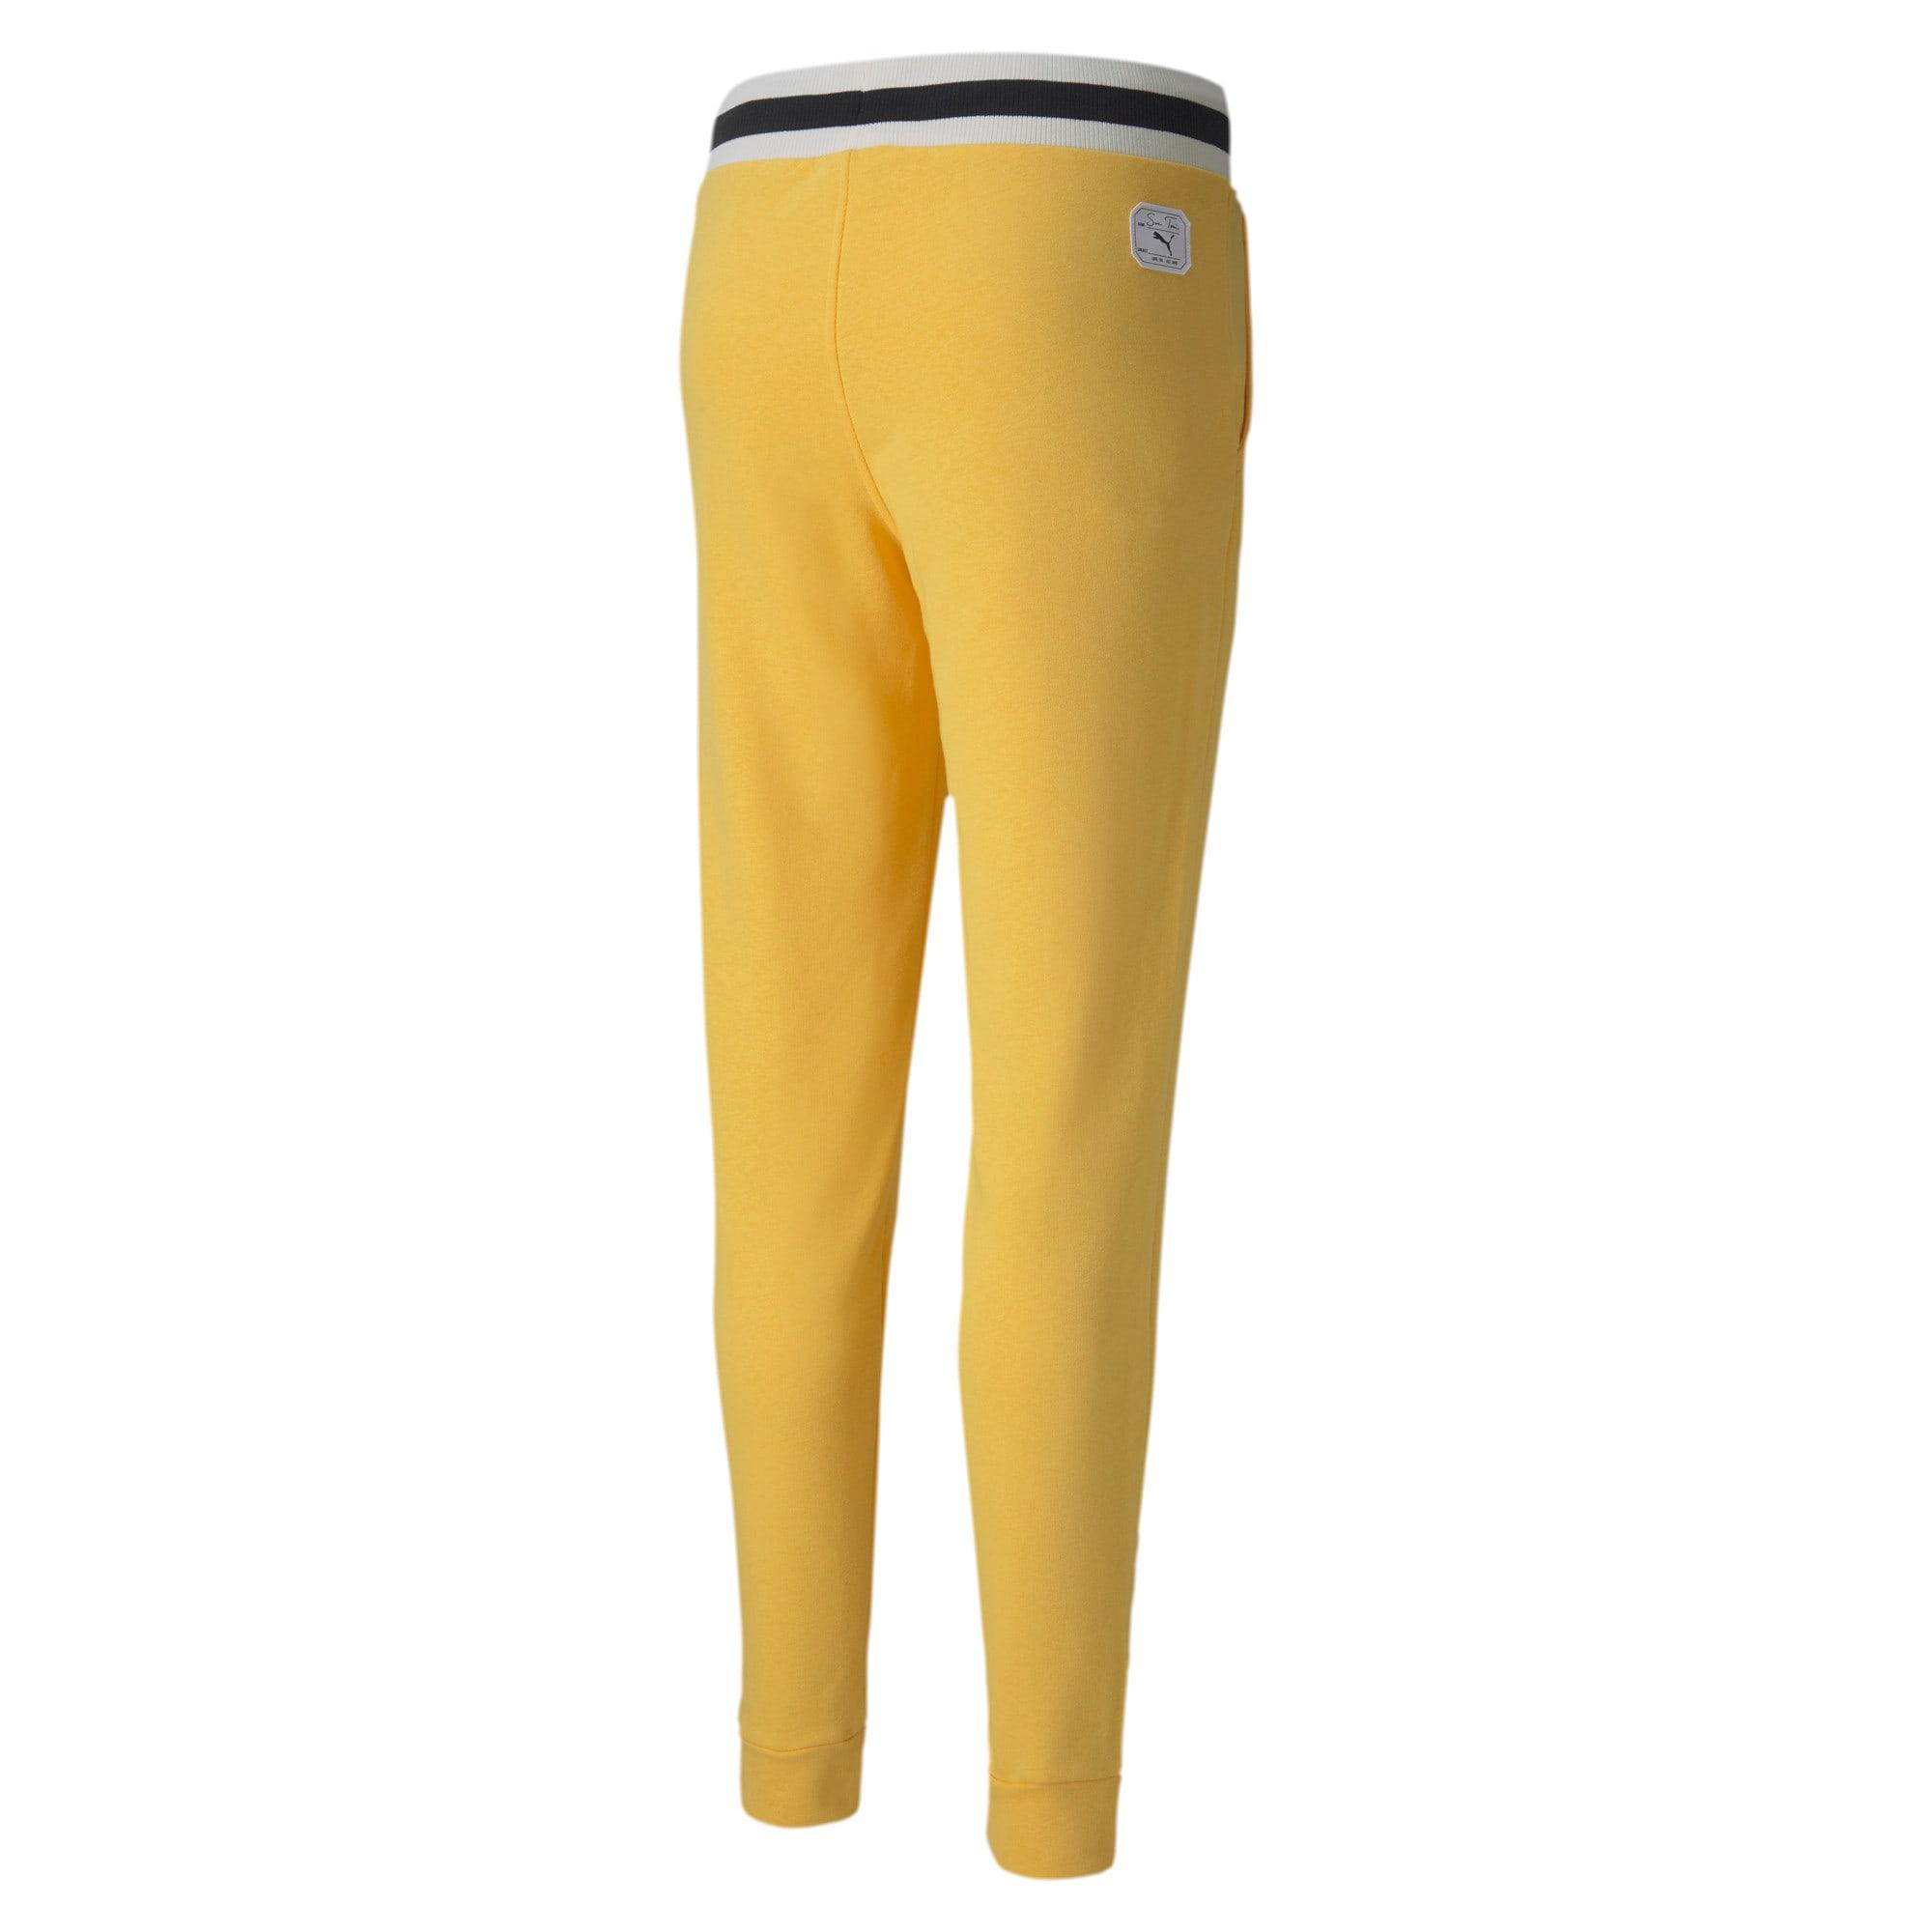 Thumbnail 2 of Pantalon en sweat PUMA x SUE TSAI pour femme, Daffodil, medium